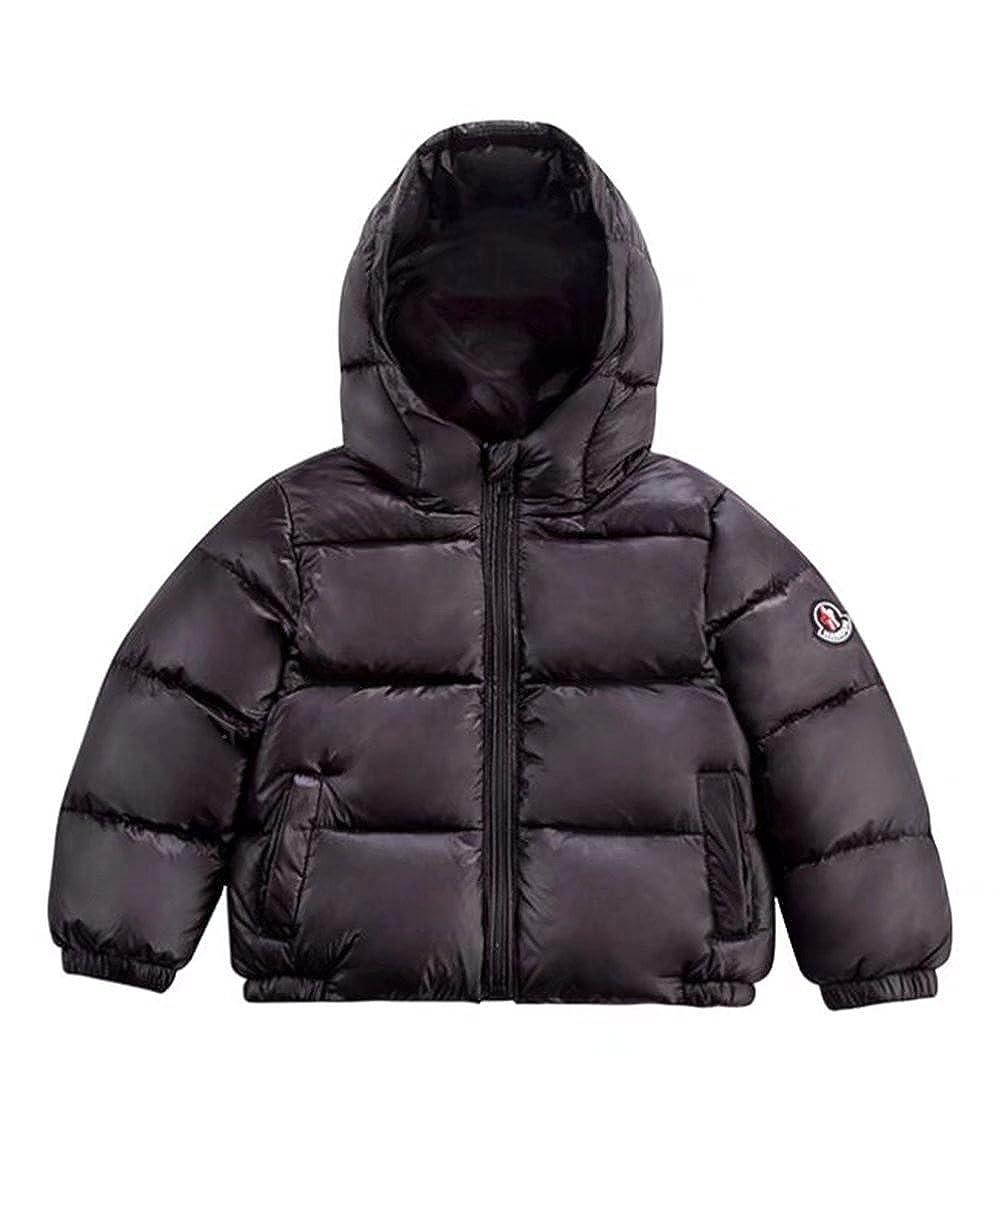 340c6d249 Top 10 wholesale Kids Down Jacket - Chinabrands.com